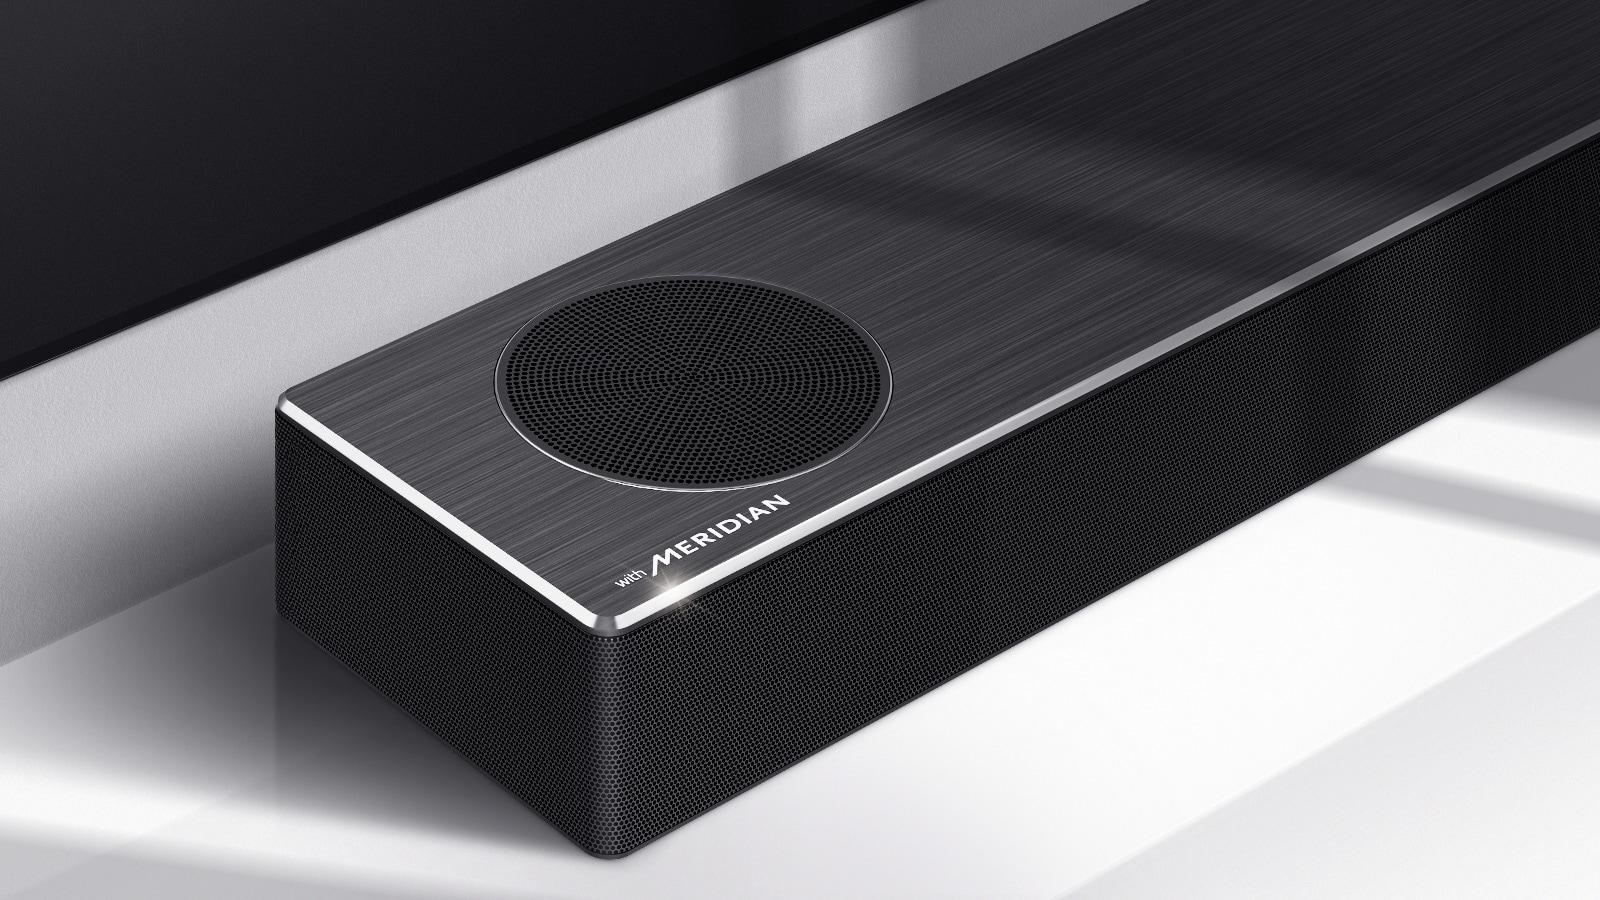 Close-up of LG Soundbar left side with Meridian logo shown on bottom left corner on a product. Bottom left side of TV is also visible.